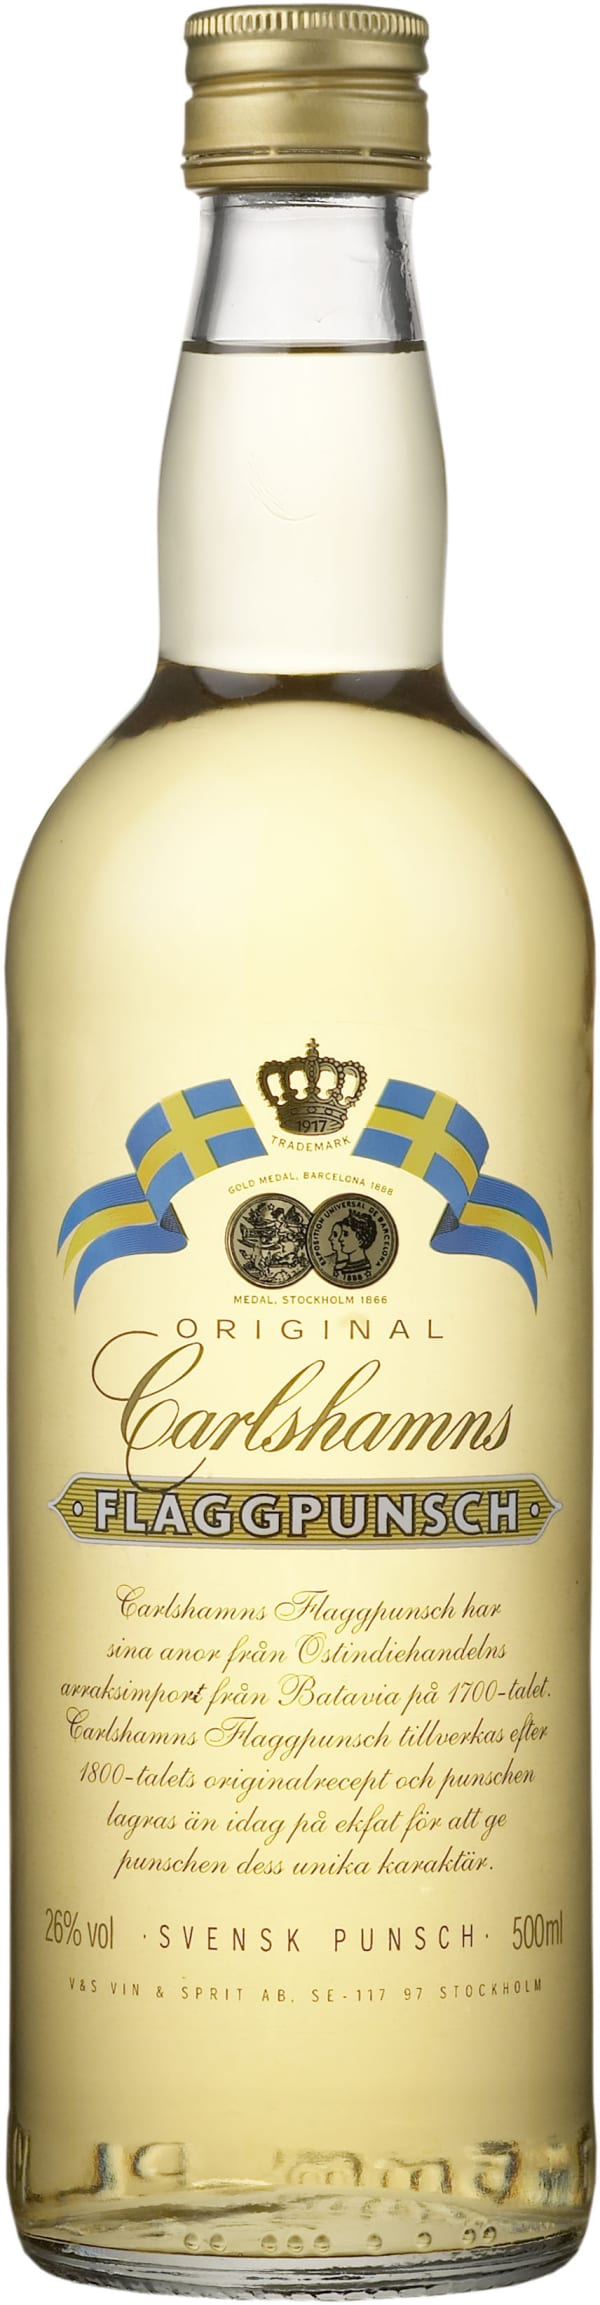 Carlshamns Flaggpunsch Original